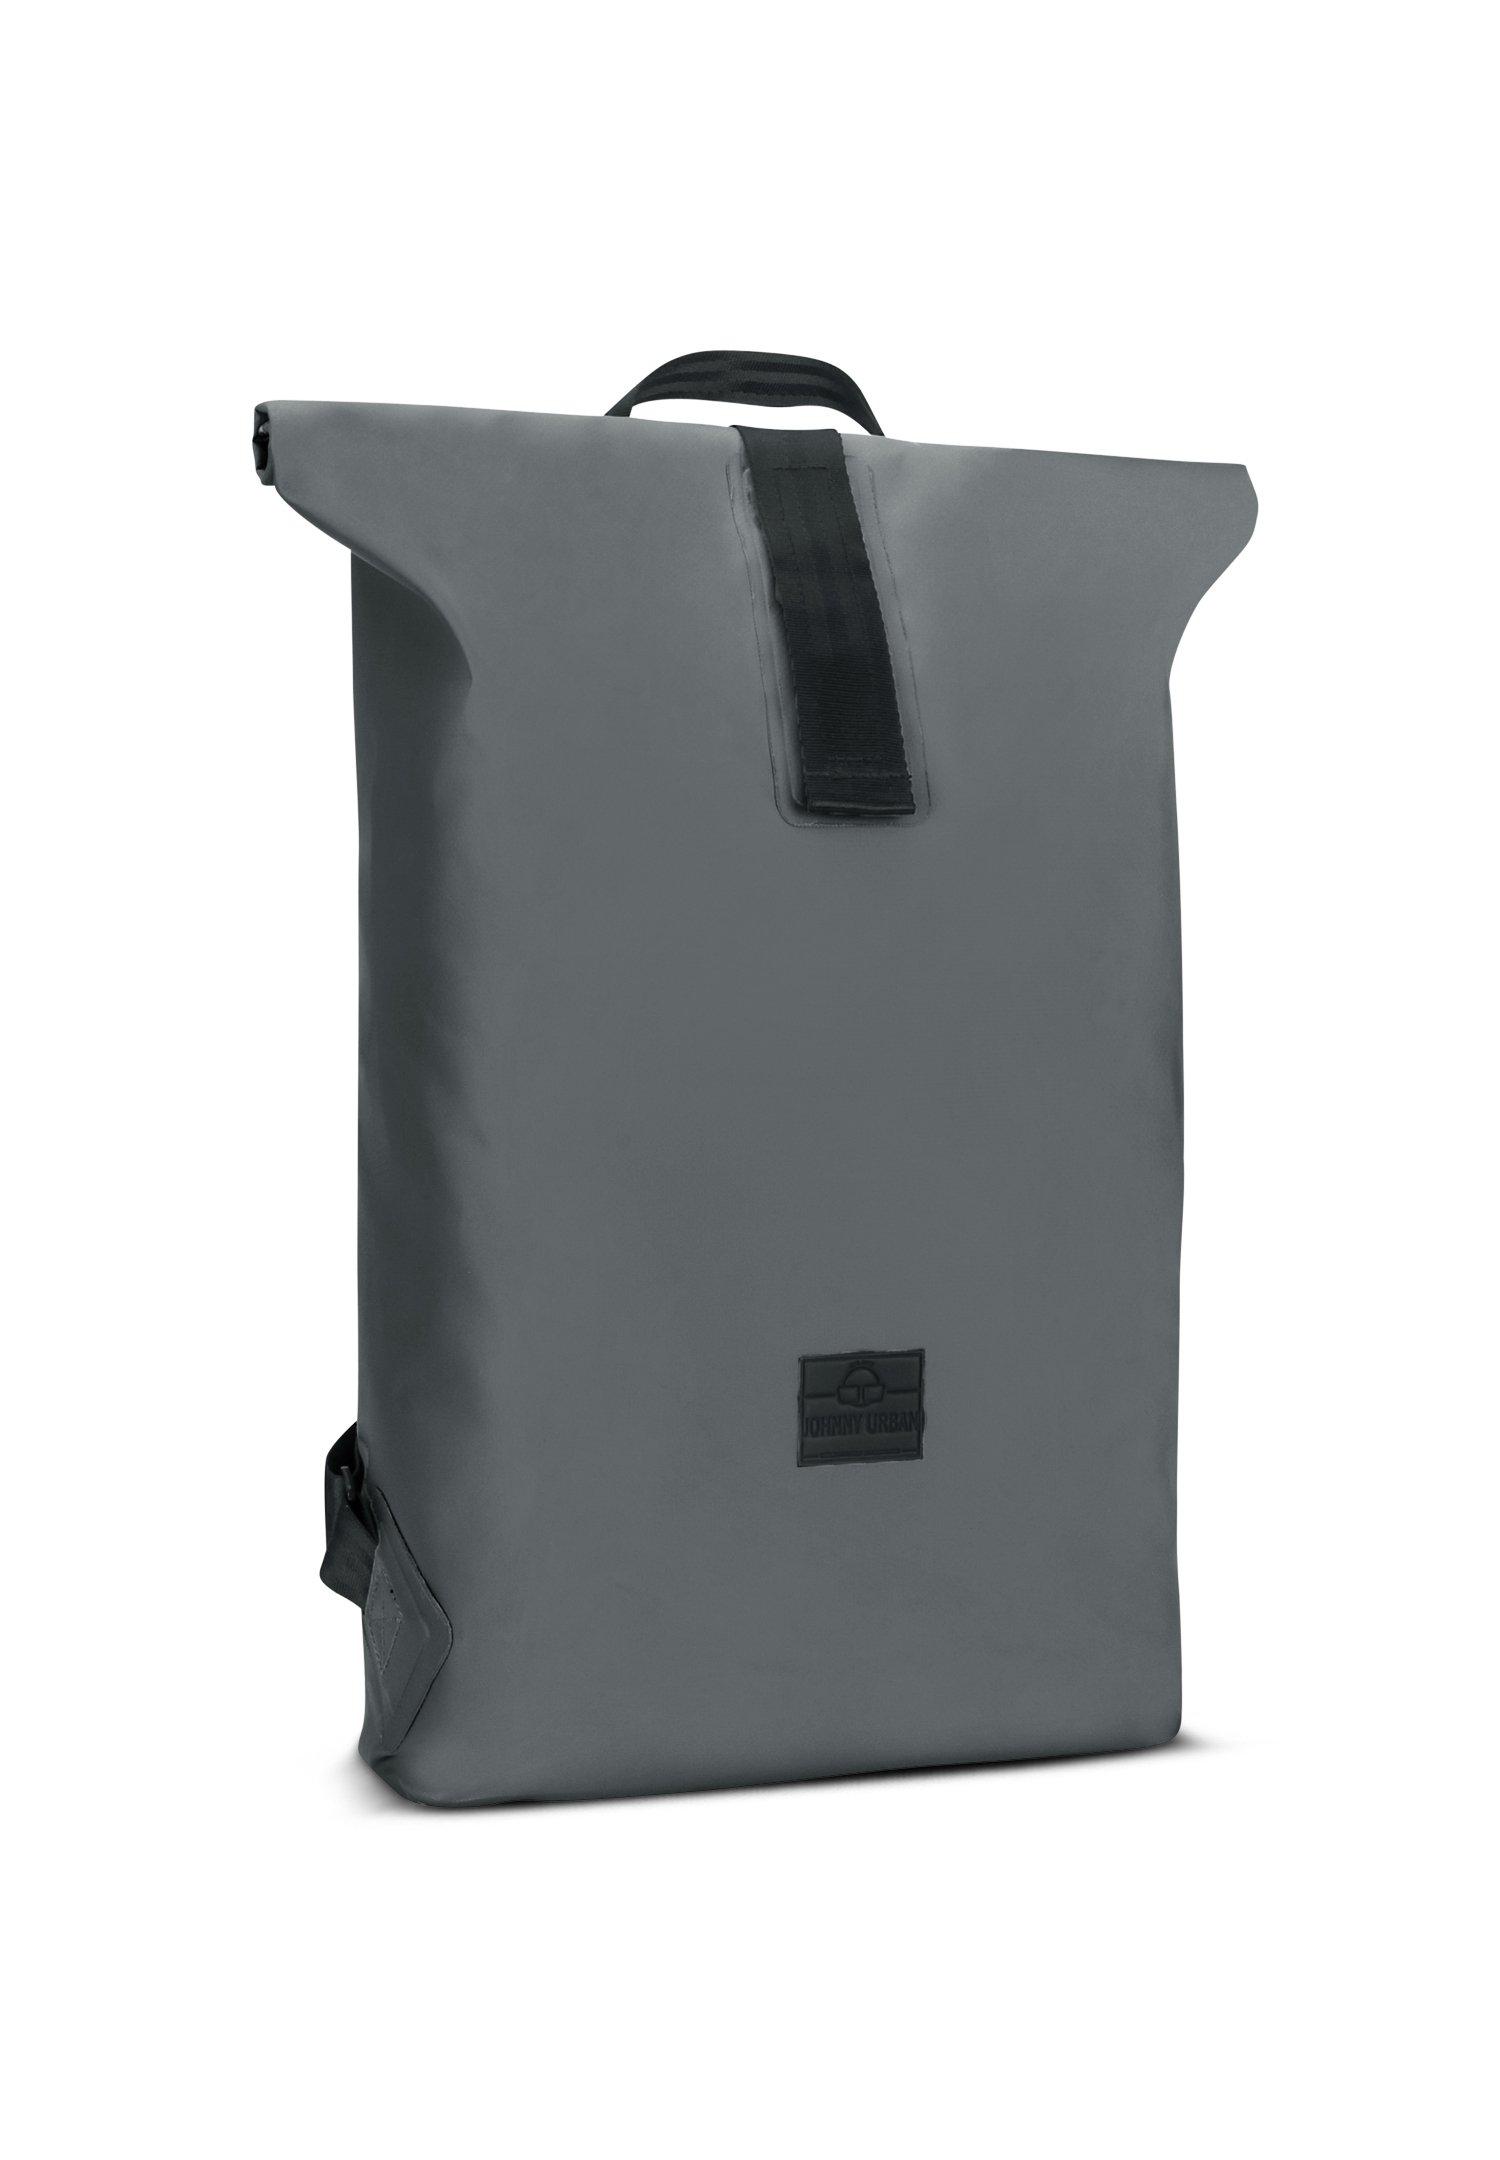 Johnny Urban ALEC - Tagesrucksack - grau - Herrentaschen pLRfY